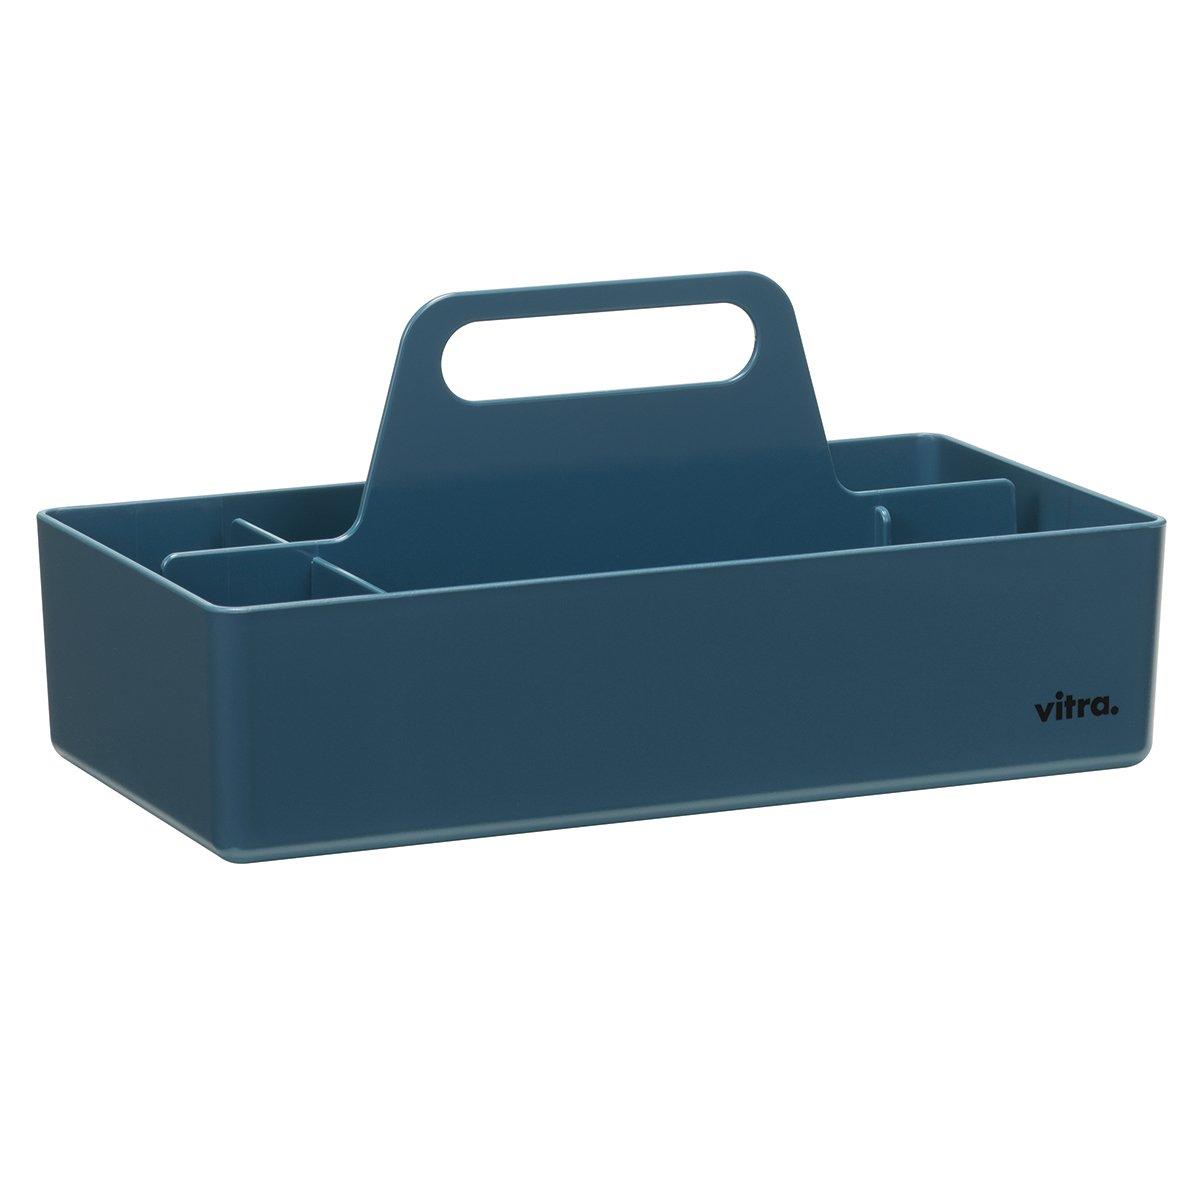 Vitra Storage Toolbox Opbergbak - Zeeblauw